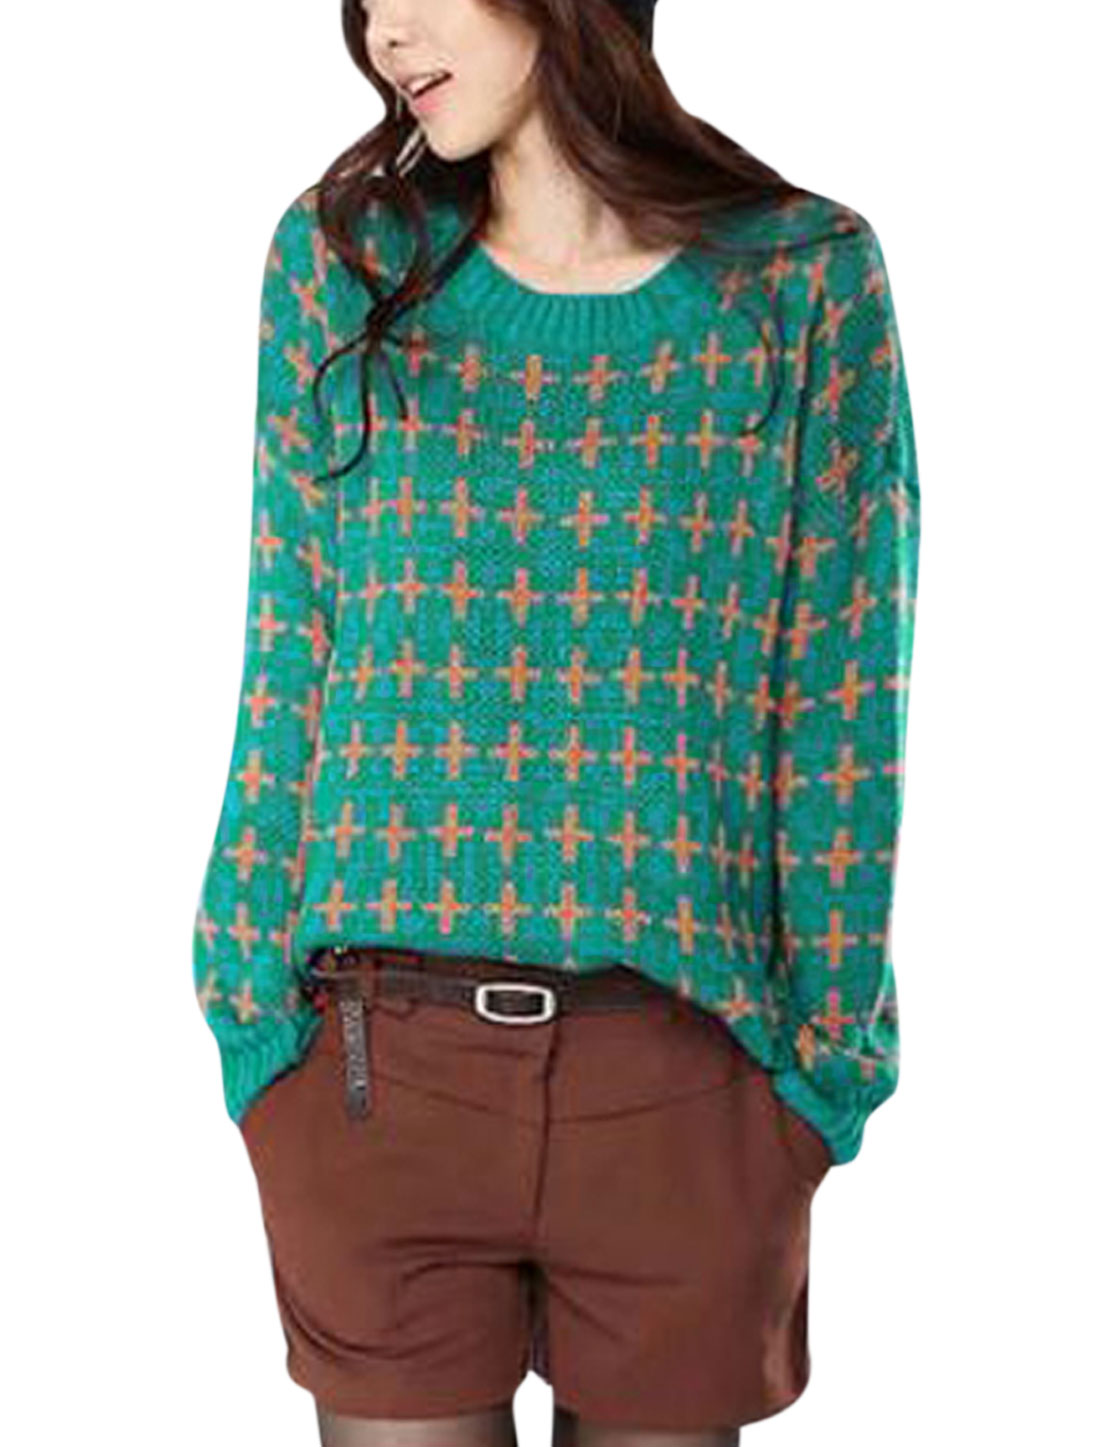 Lady Pullover Cross Pattern Irregular Hem Leisure Sweater Green S